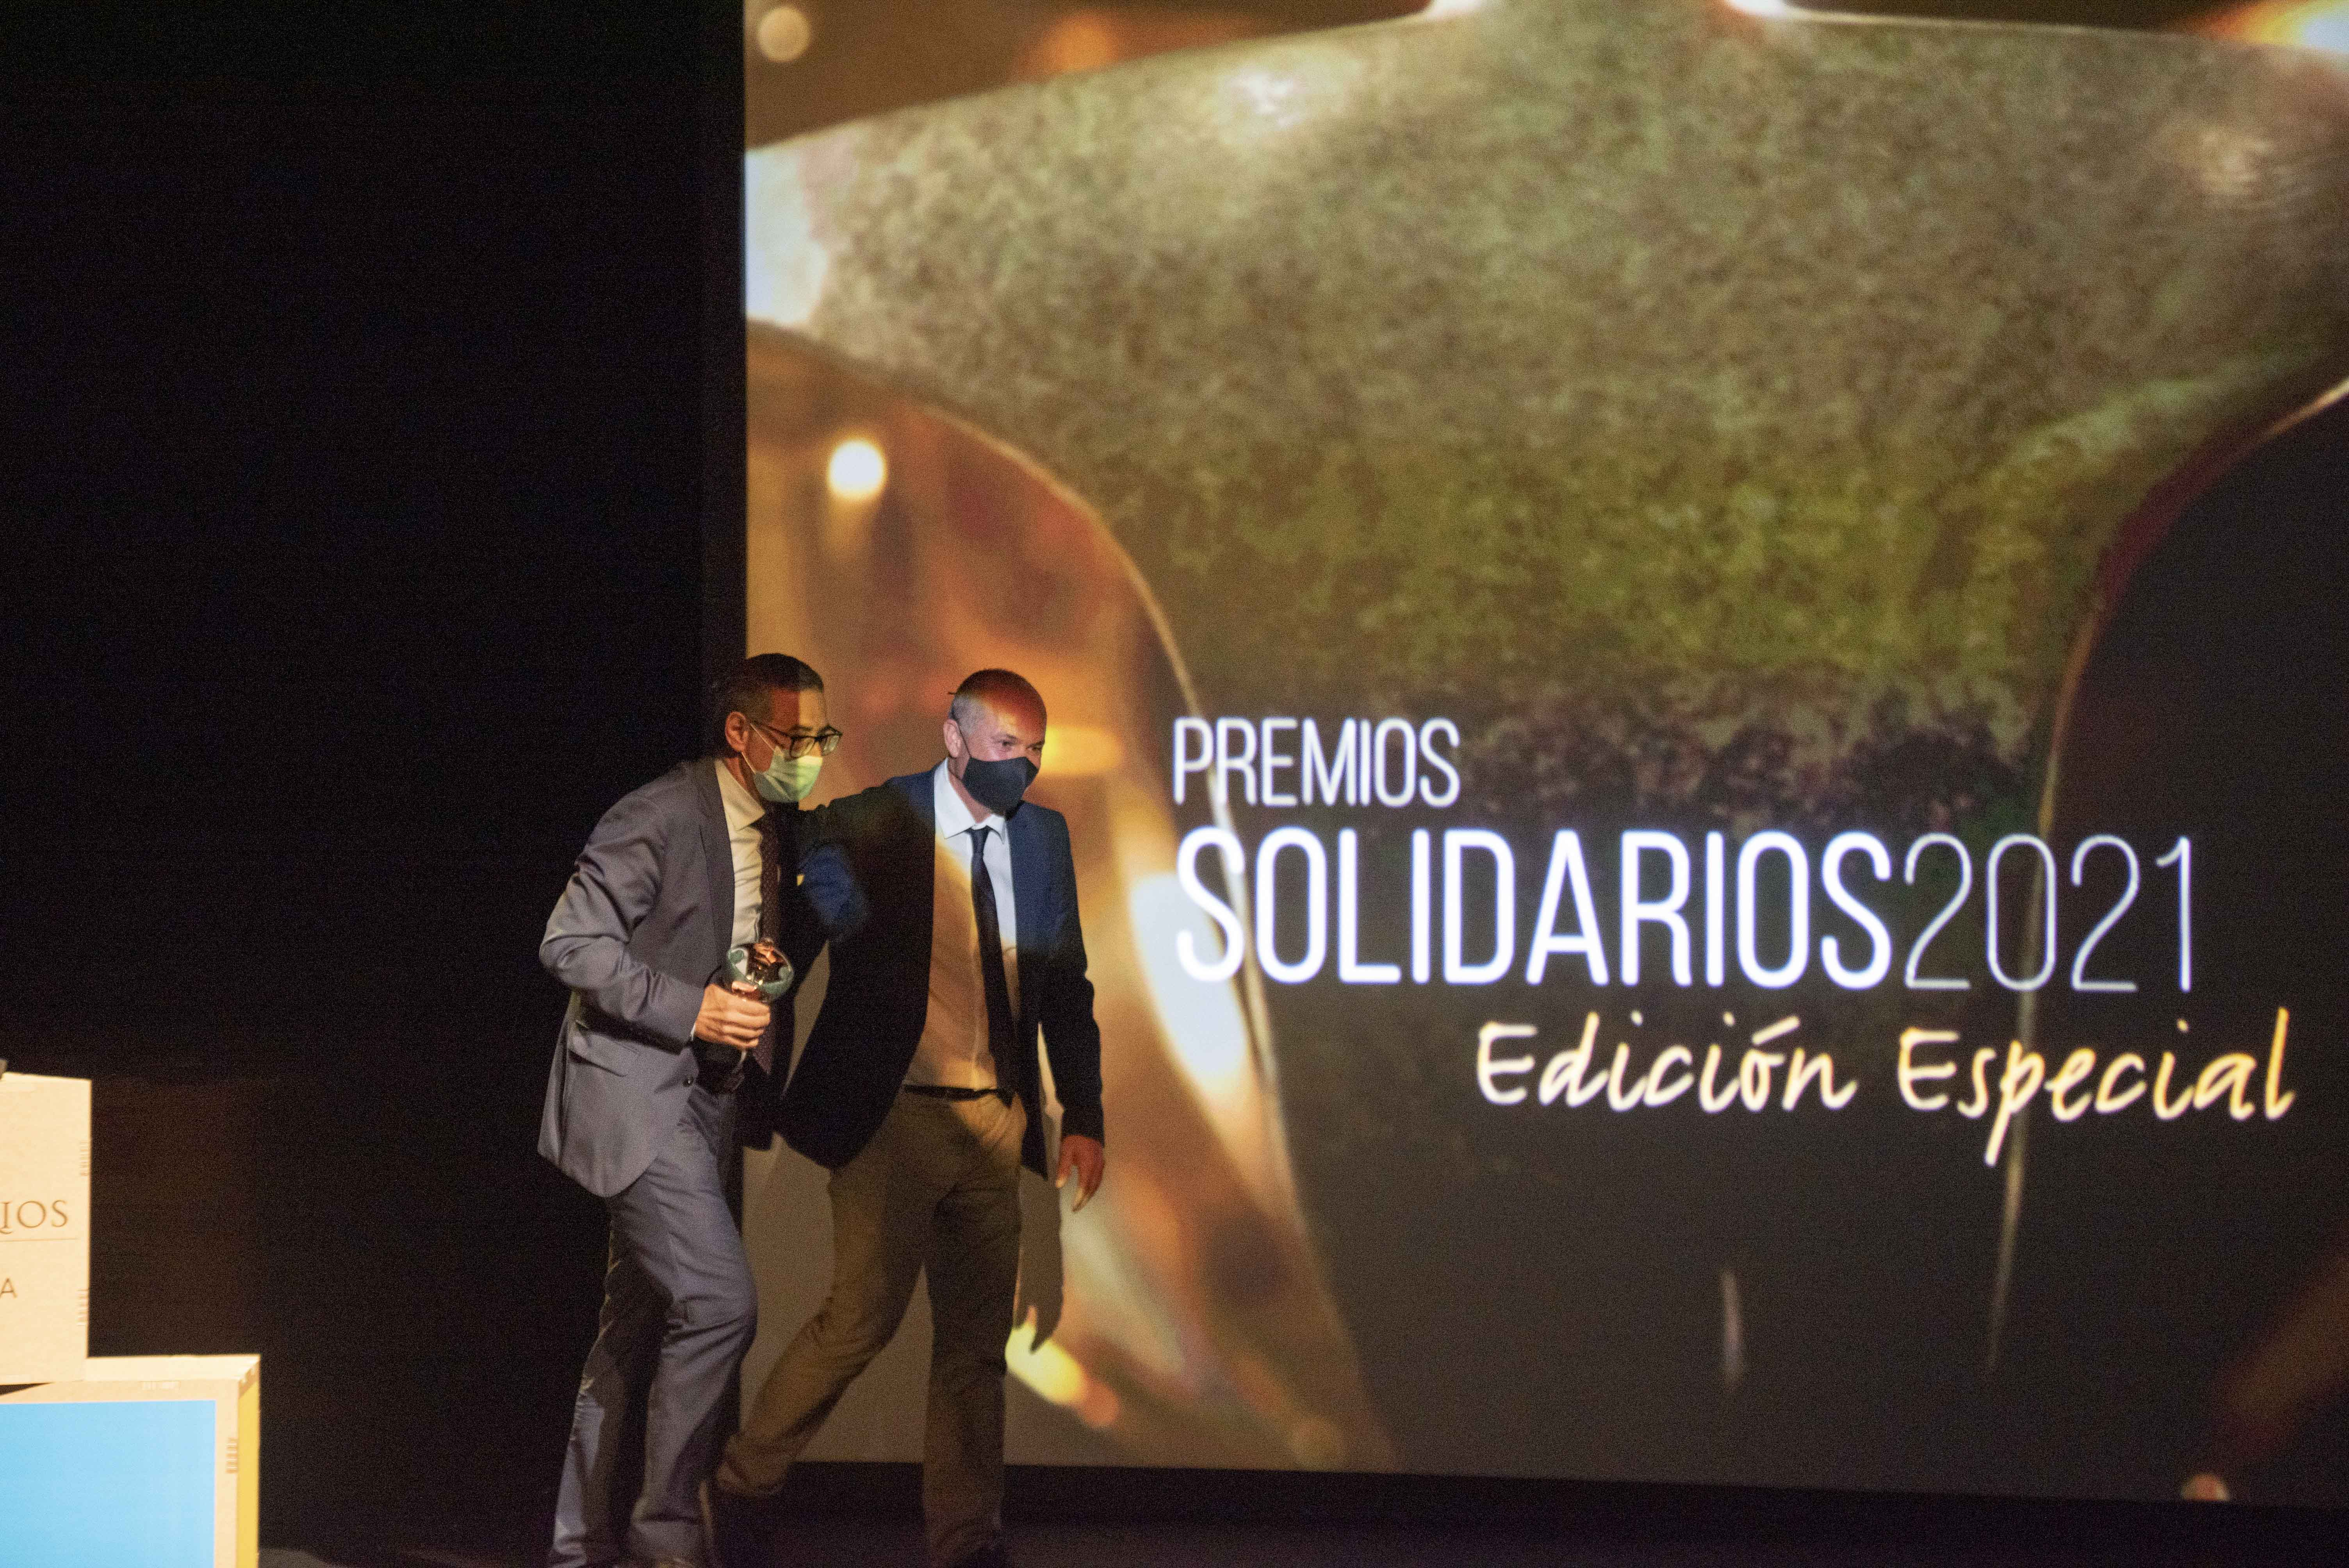 La ONCE premia ODSesiones